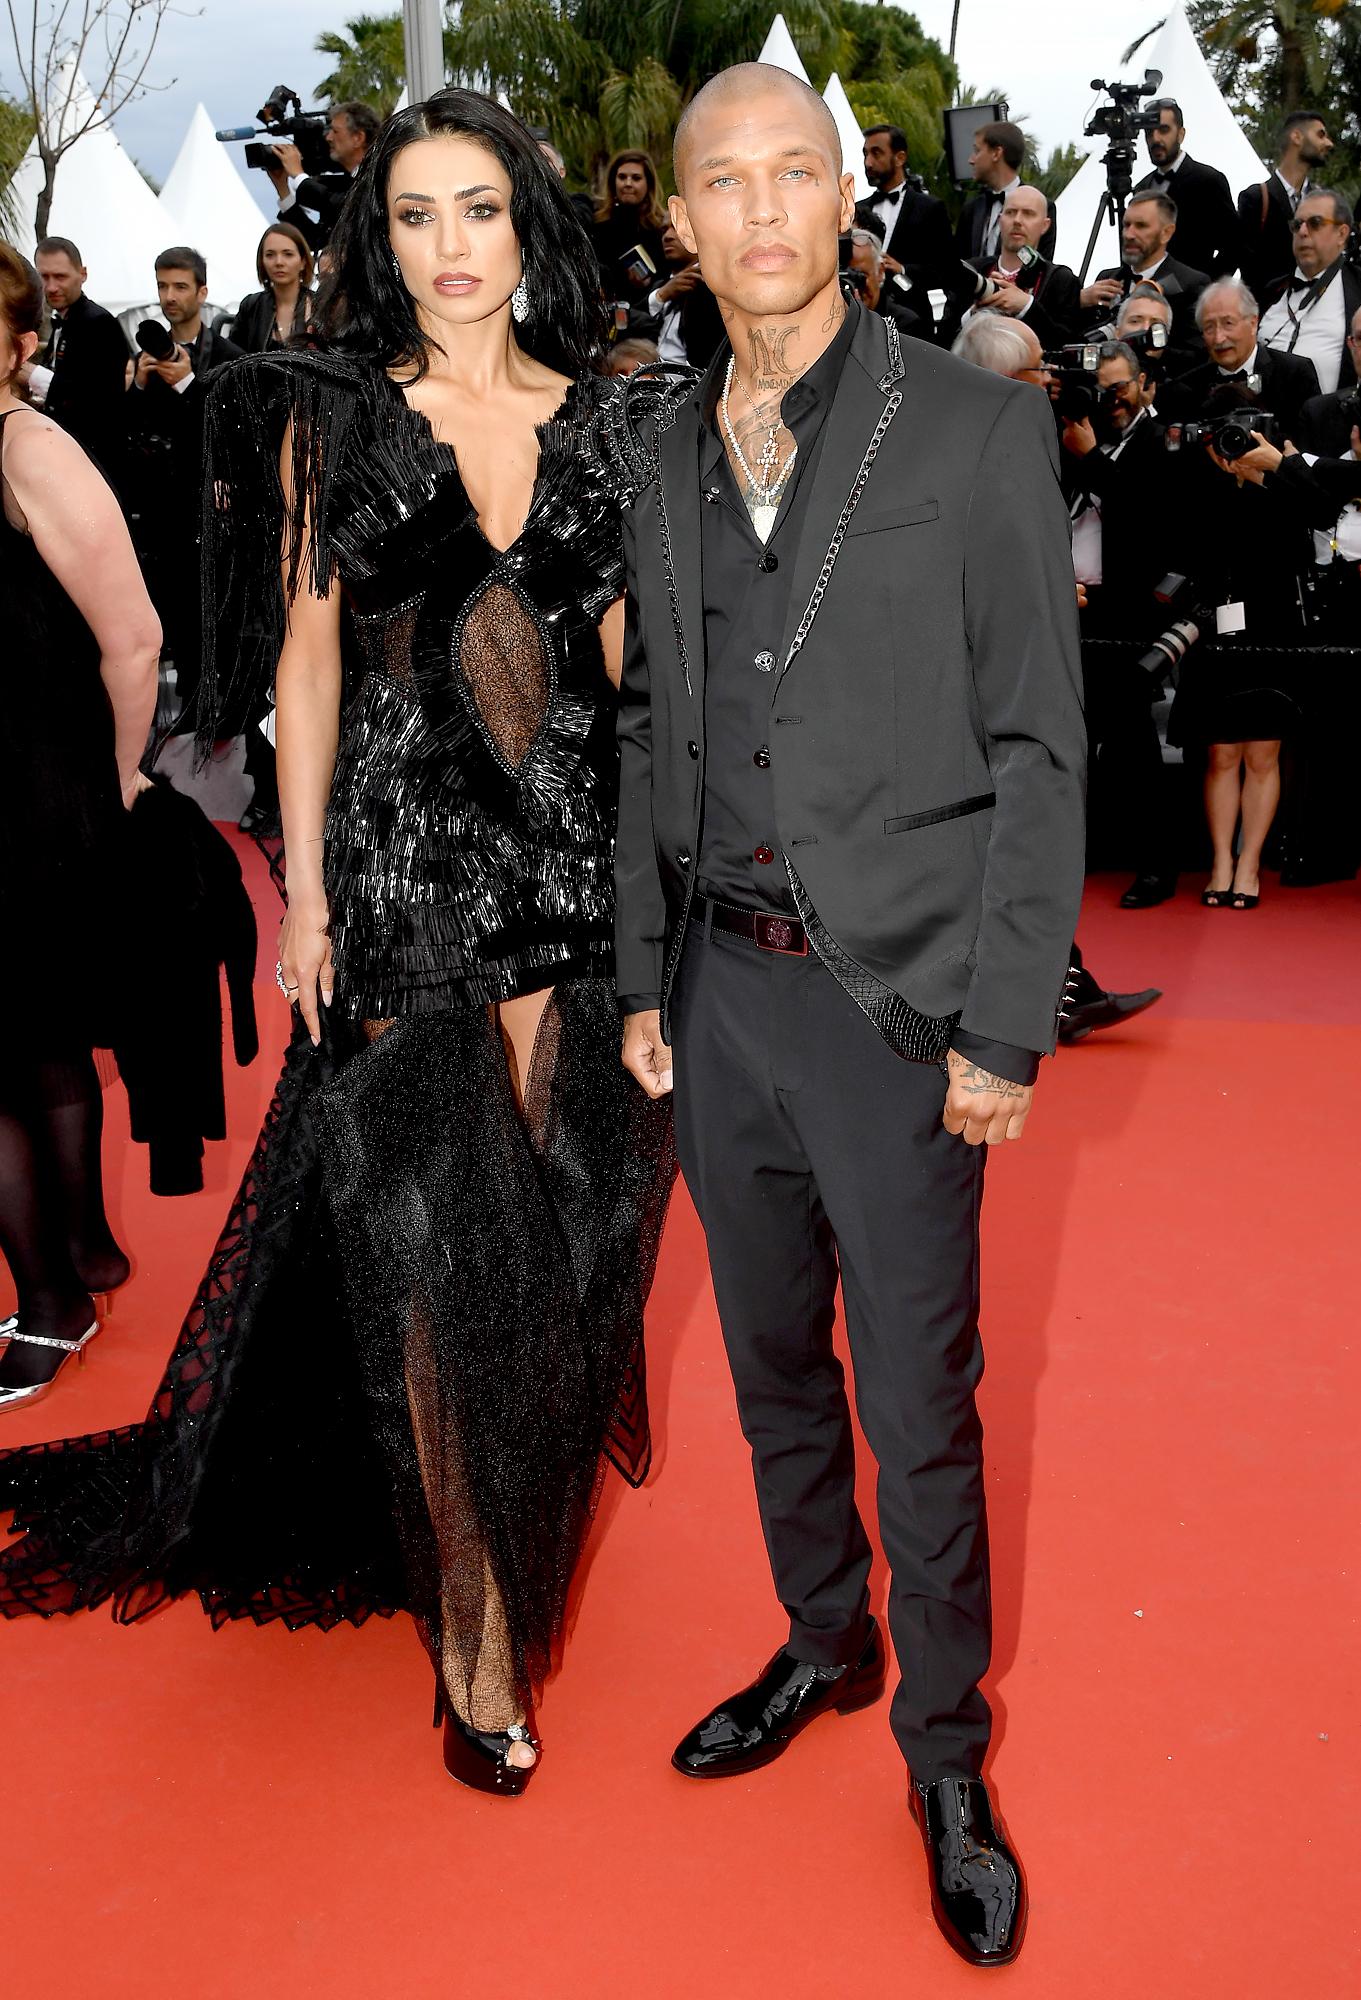 Andreea-Sasu-and-Jeremy-Meeks-Cannes